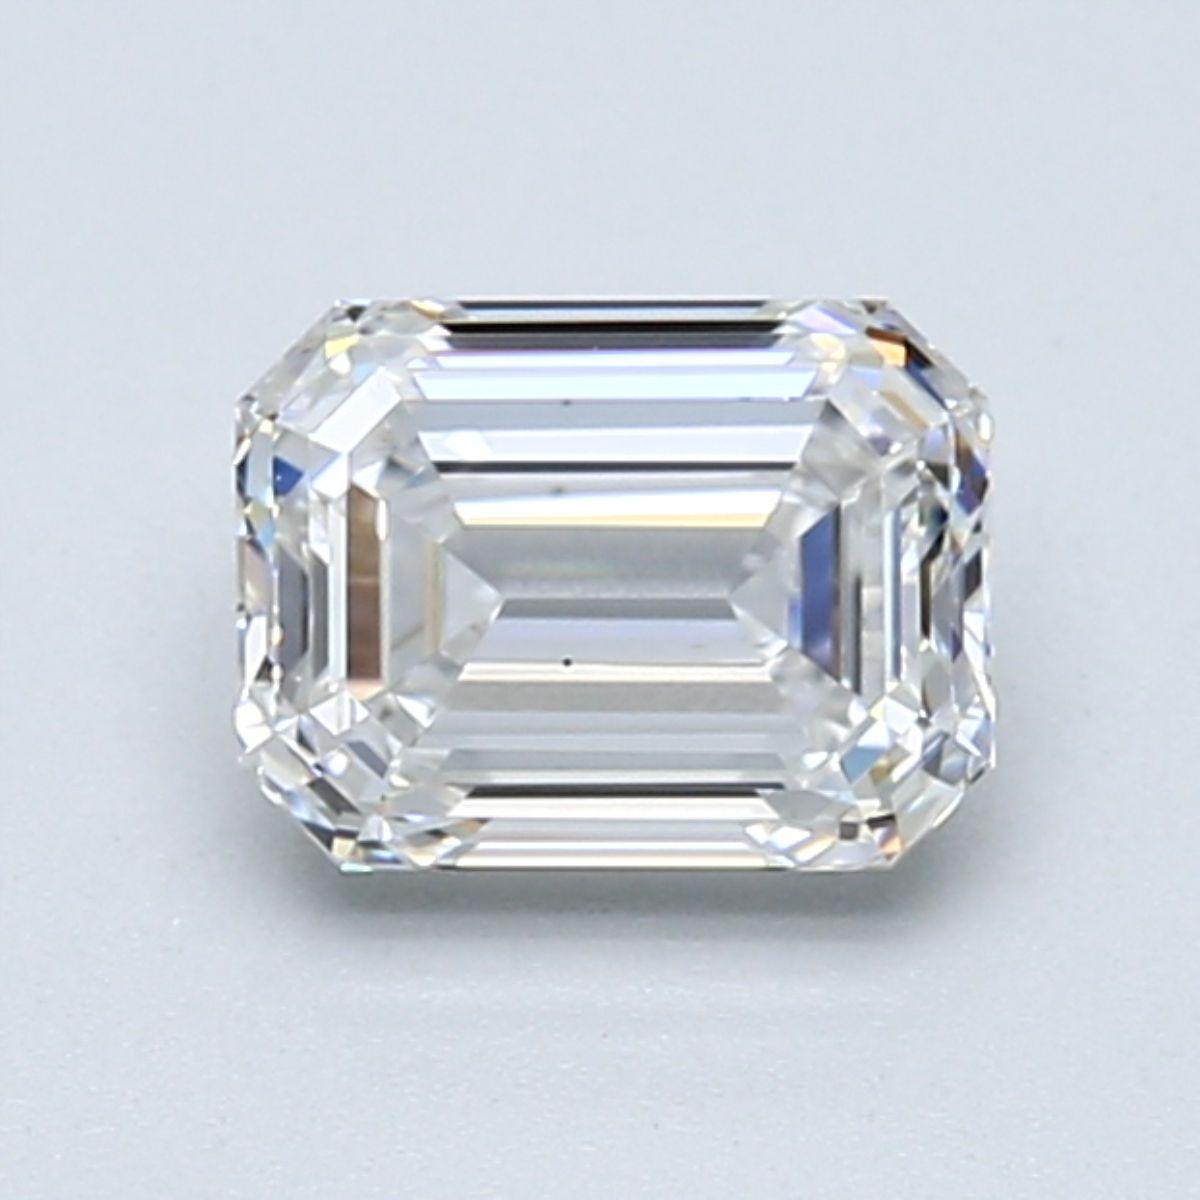 1.21 carat Emerald, Very Good Cut, F Color VS2 Clarity diamond. GIA Certified.